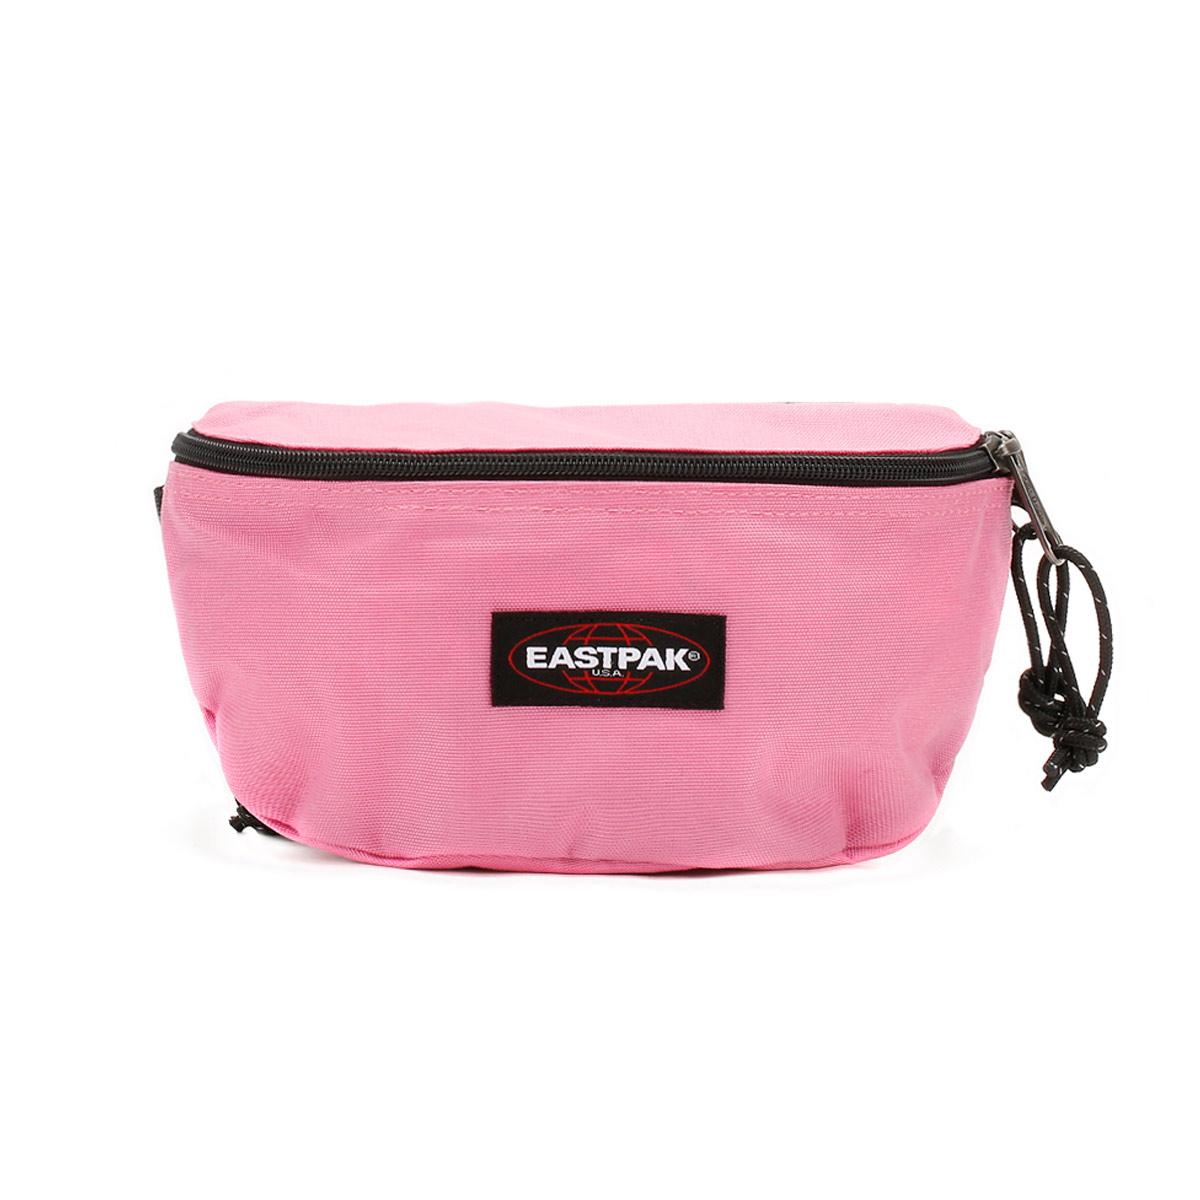 Eastpak Travel Bags Uk